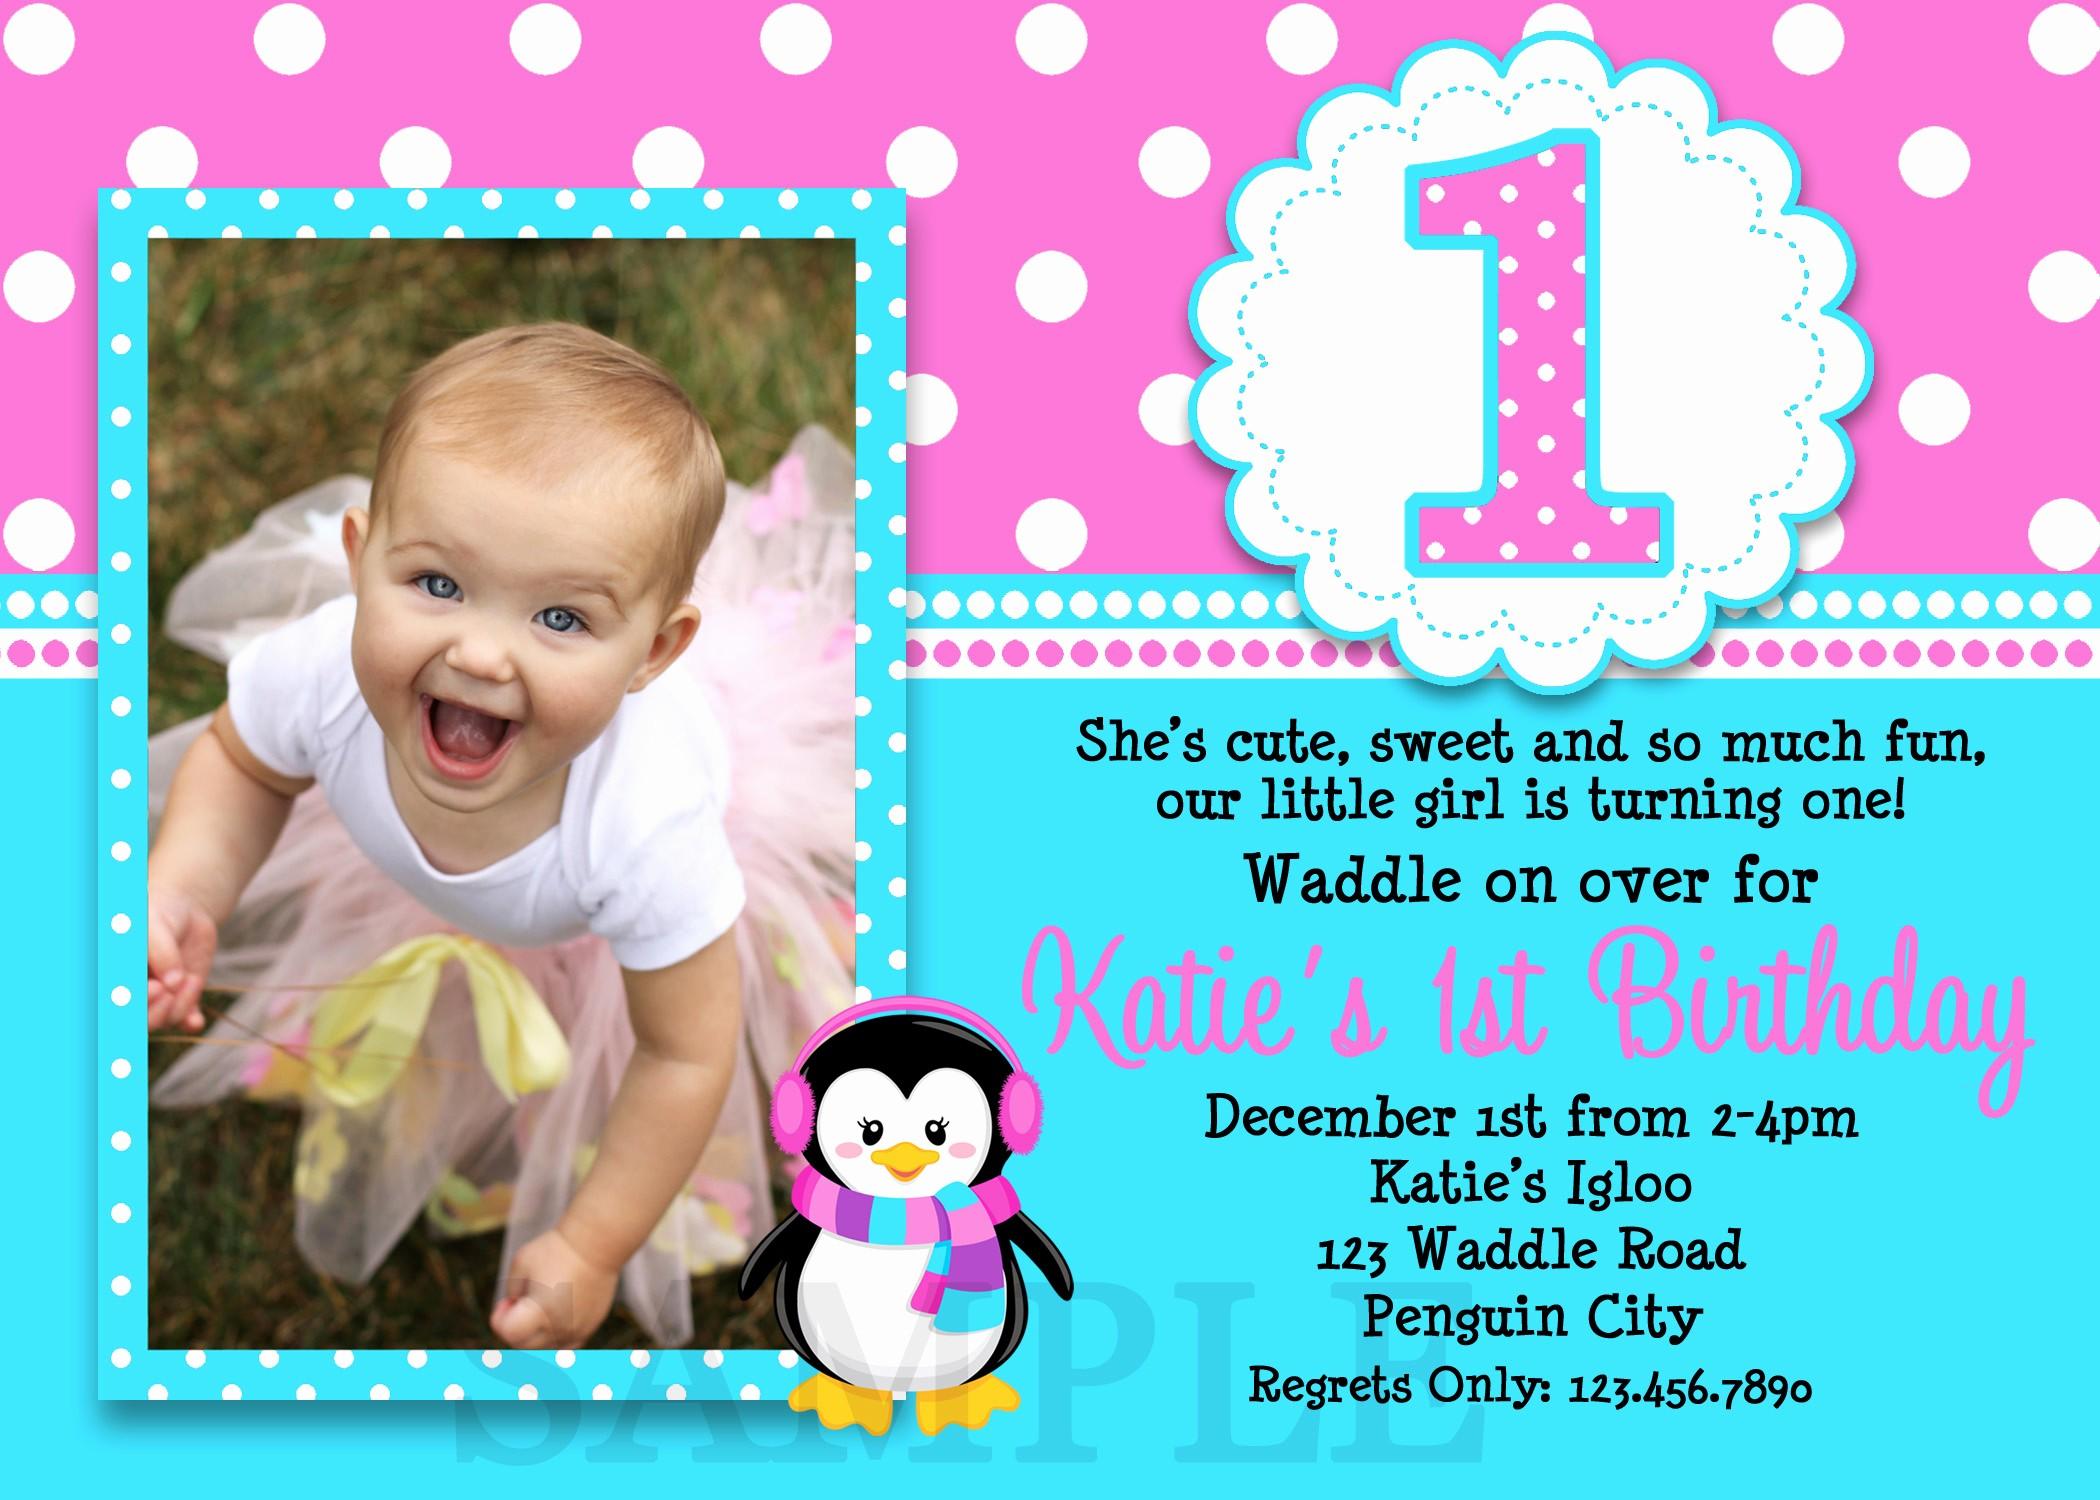 Birthday Party Invitation Card Template Fresh 1st Birthday Invitations Girl Free Template Baby Girl S